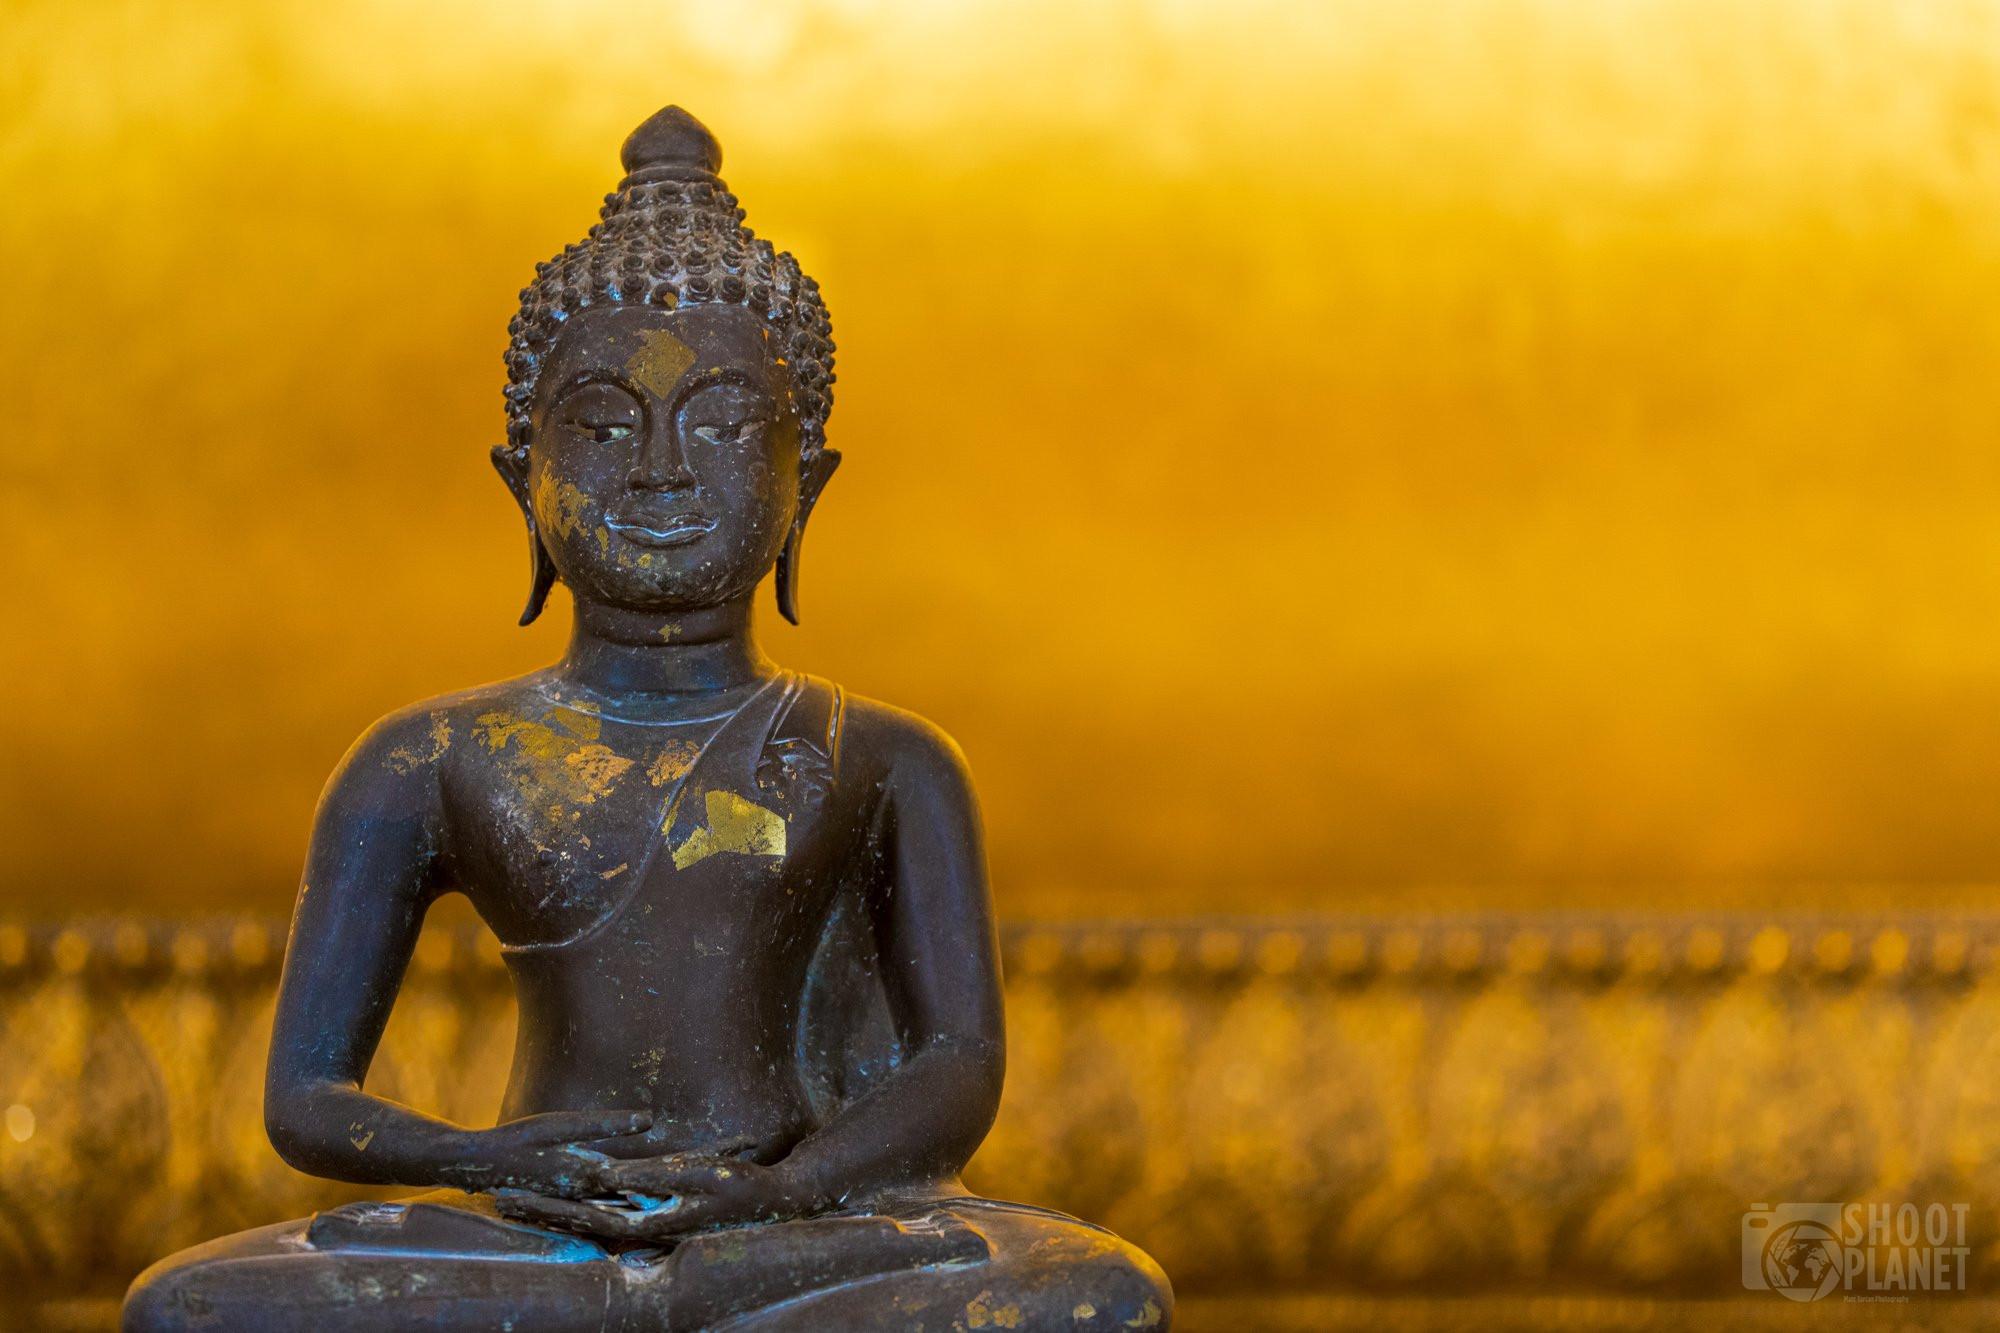 Black gold Buddha, Wat Pho, Bangkok Thailand